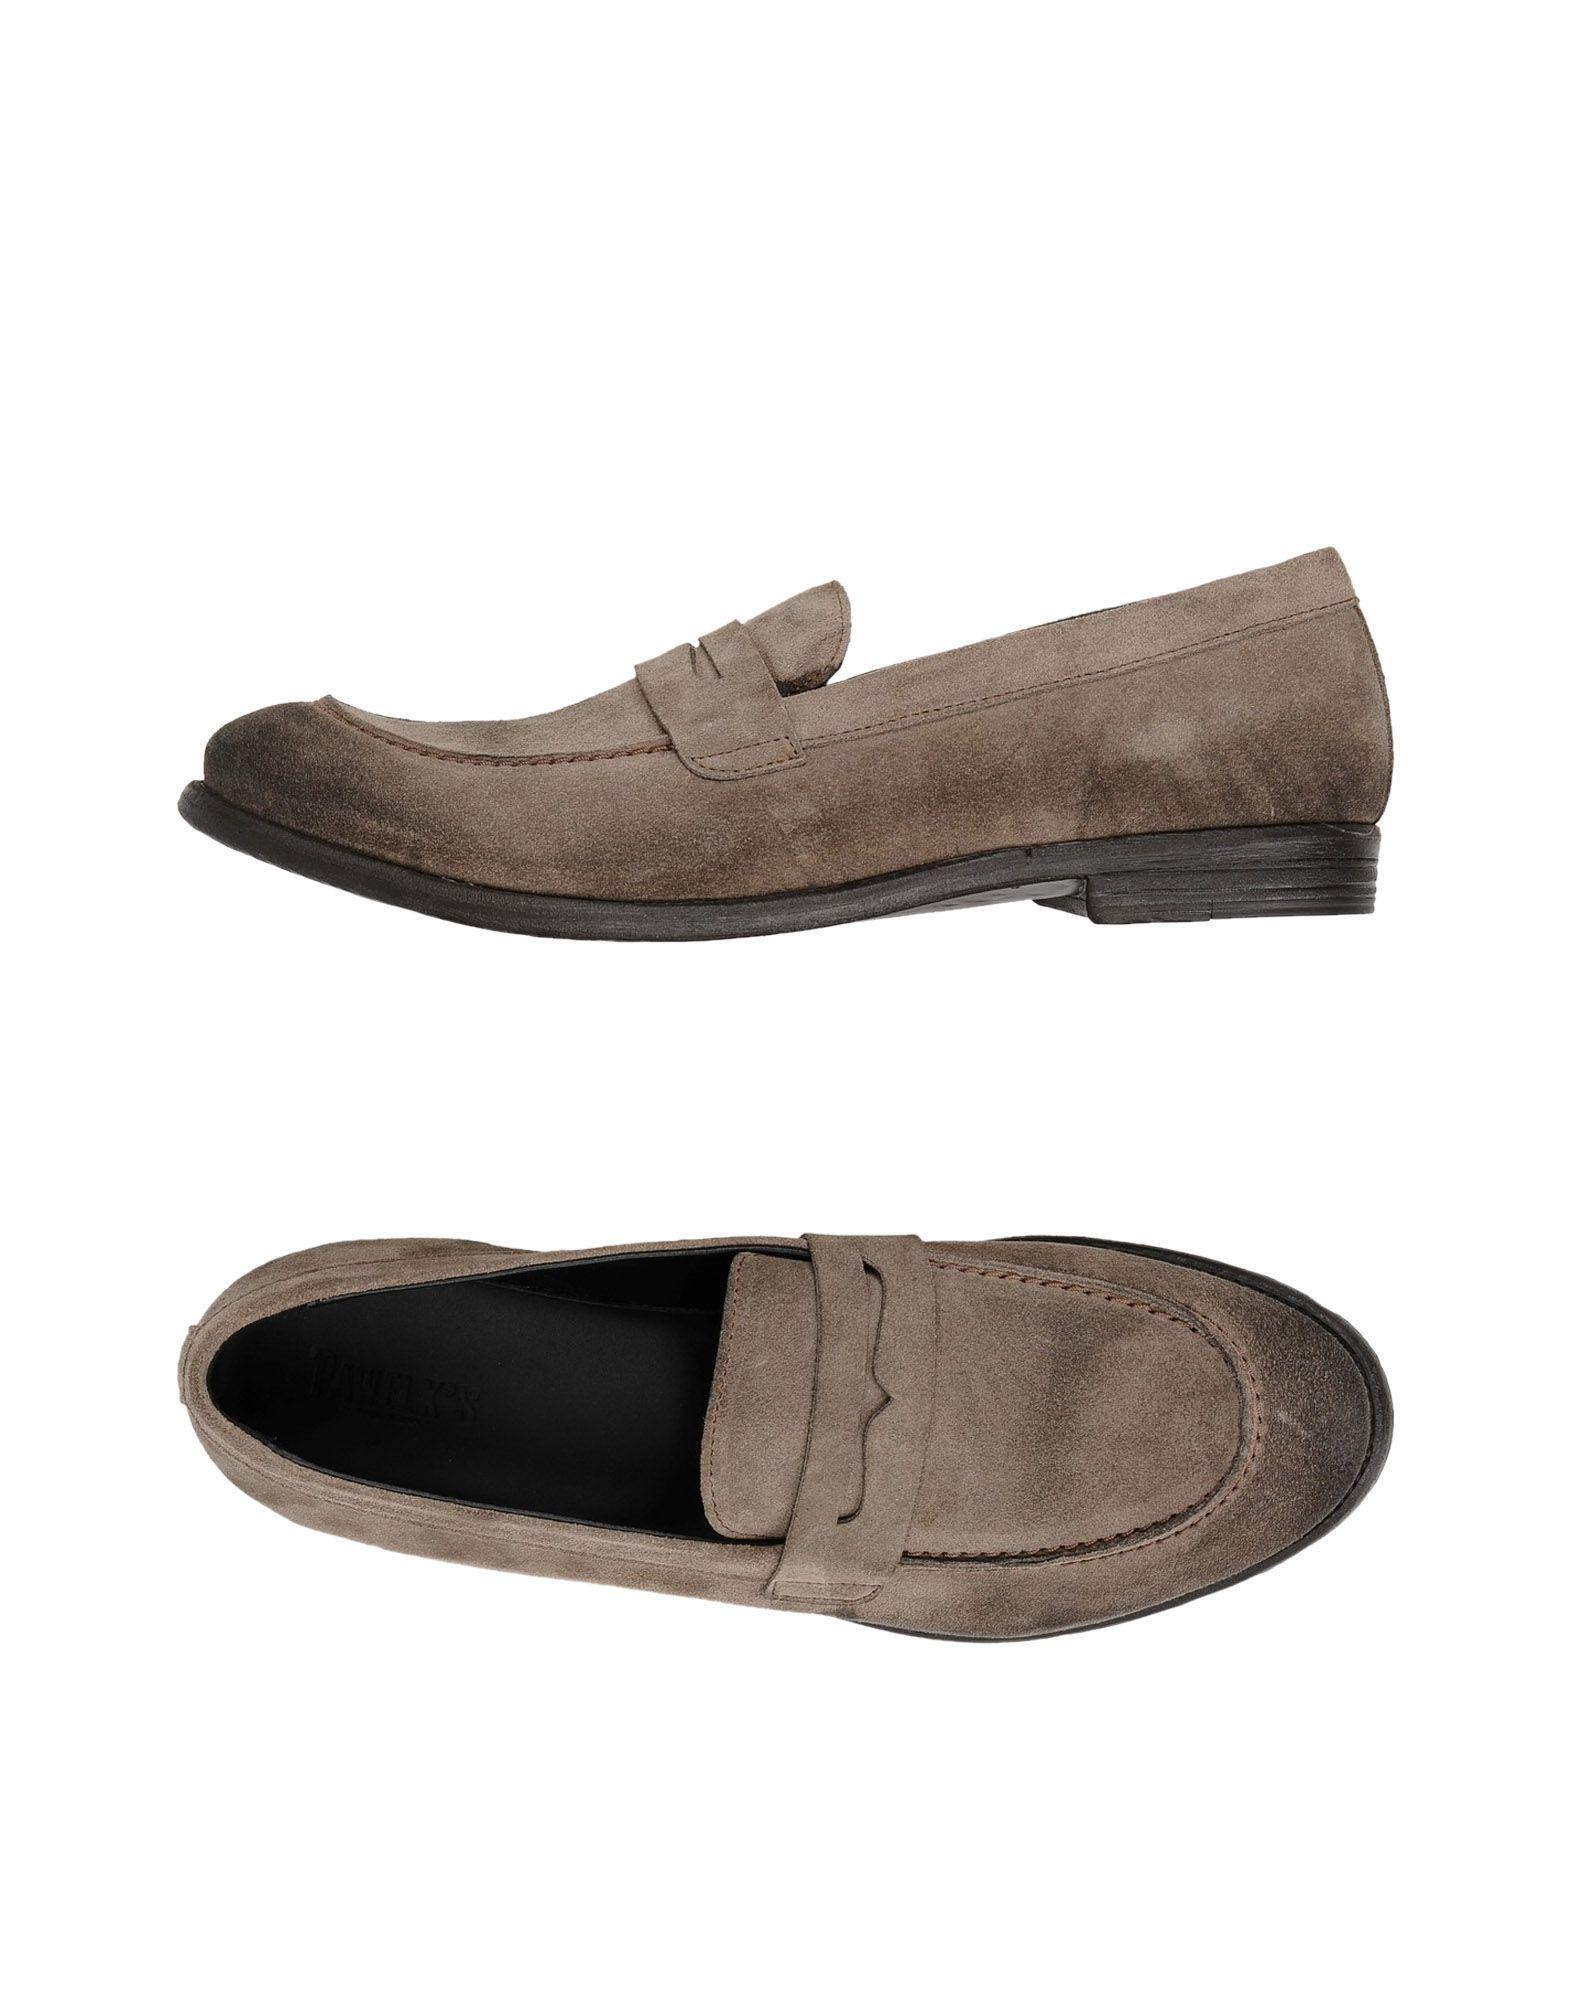 PAWELK'S Loafers in Grey